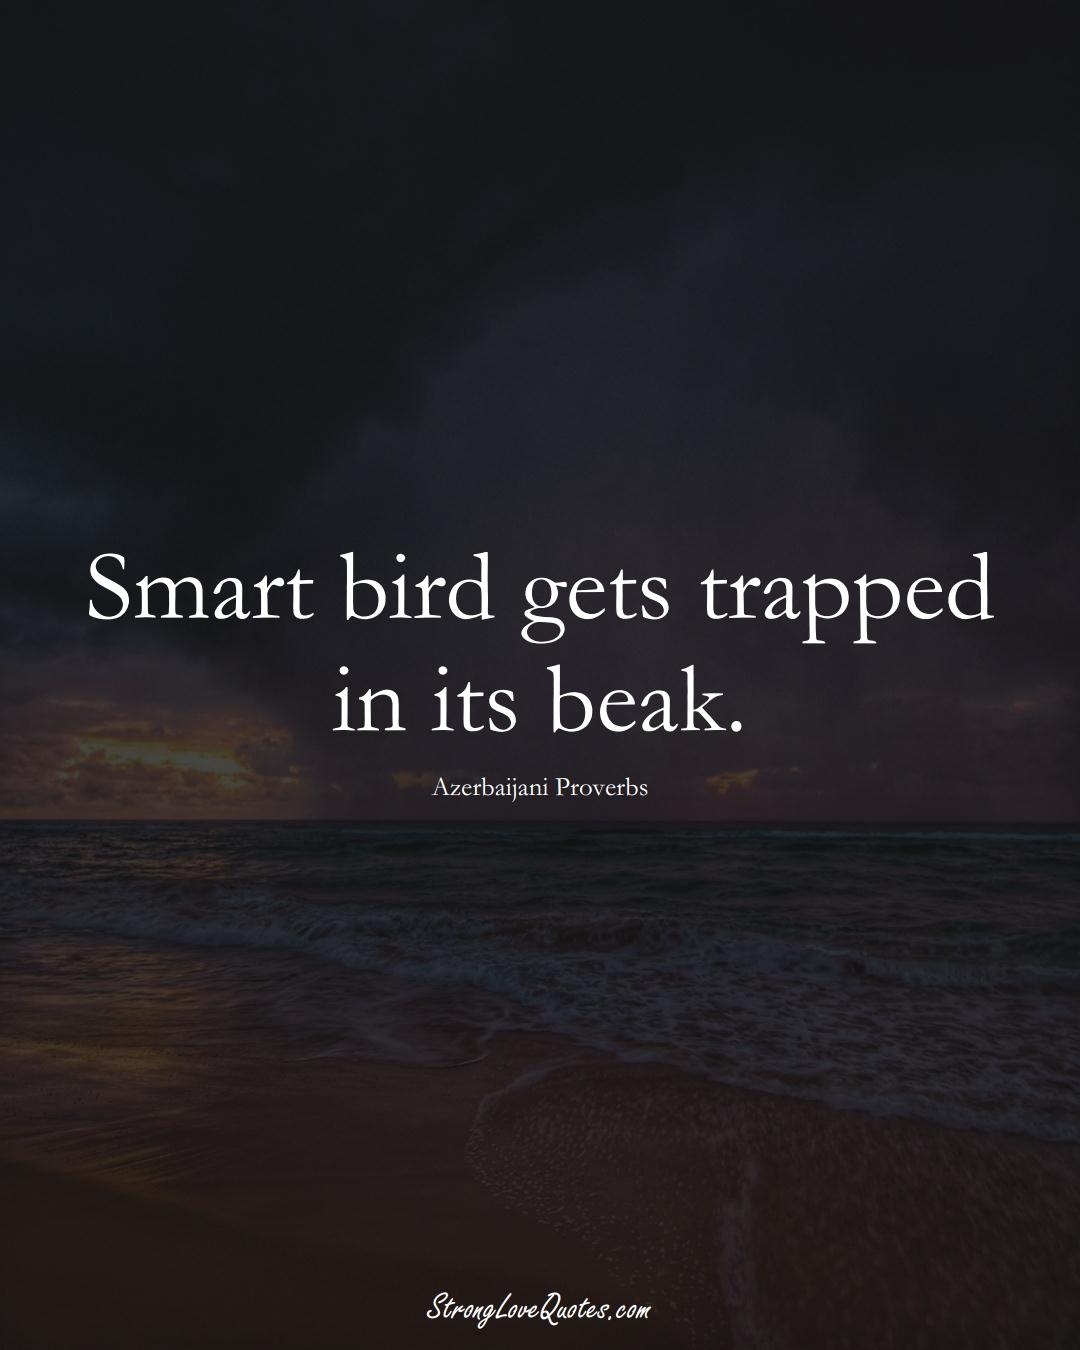 Smart bird gets trapped in its beak. (Azerbaijani Sayings);  #AsianSayings